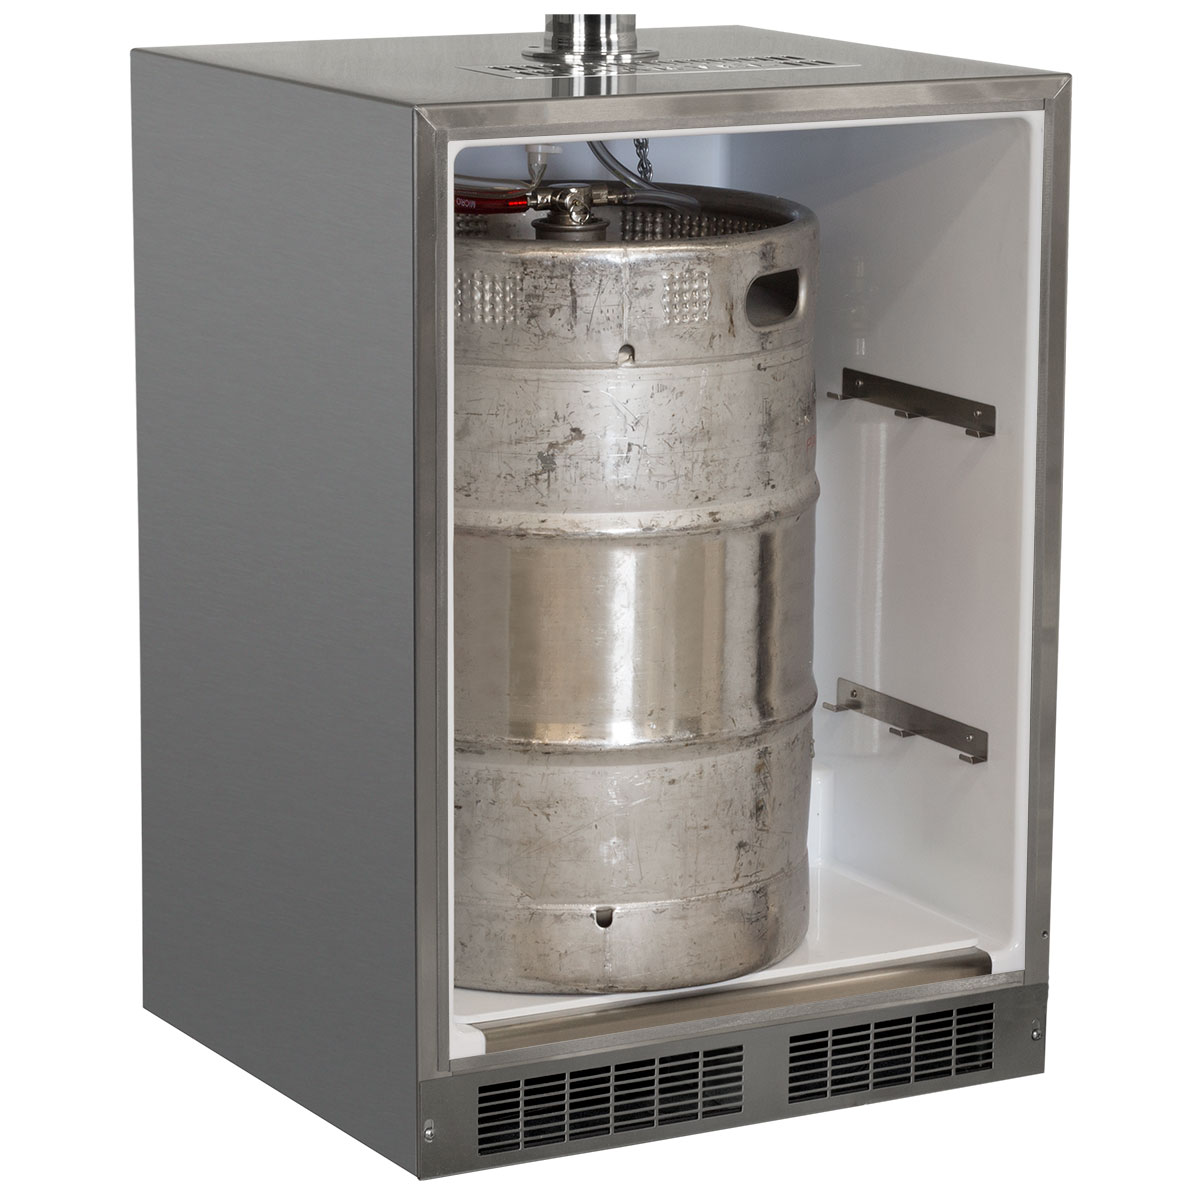 "Model: MO24BTSMRS | Marvel  Outdoor 24"" Twin Tap Mobile Beer Dispenser with Stainless Steel Door-Right Hinge"